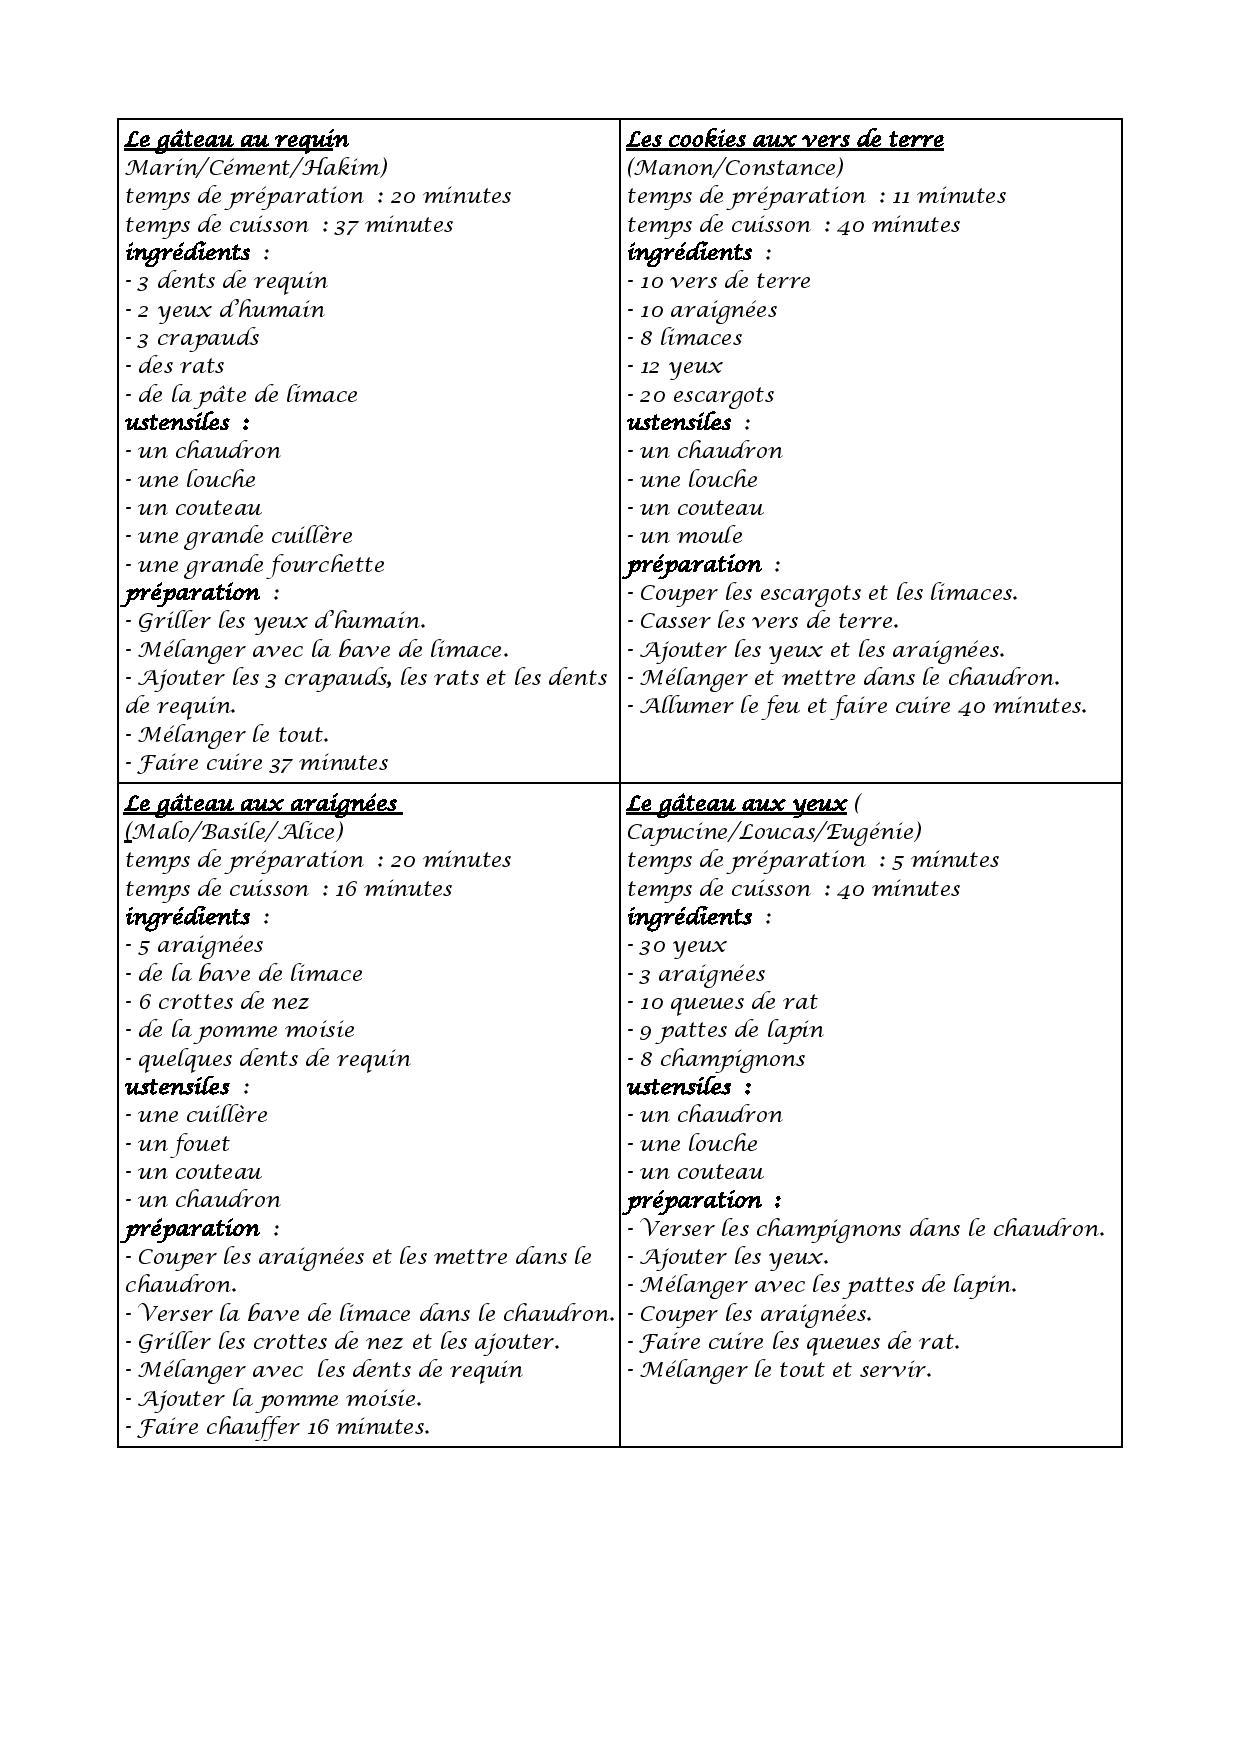 recettes-page-002